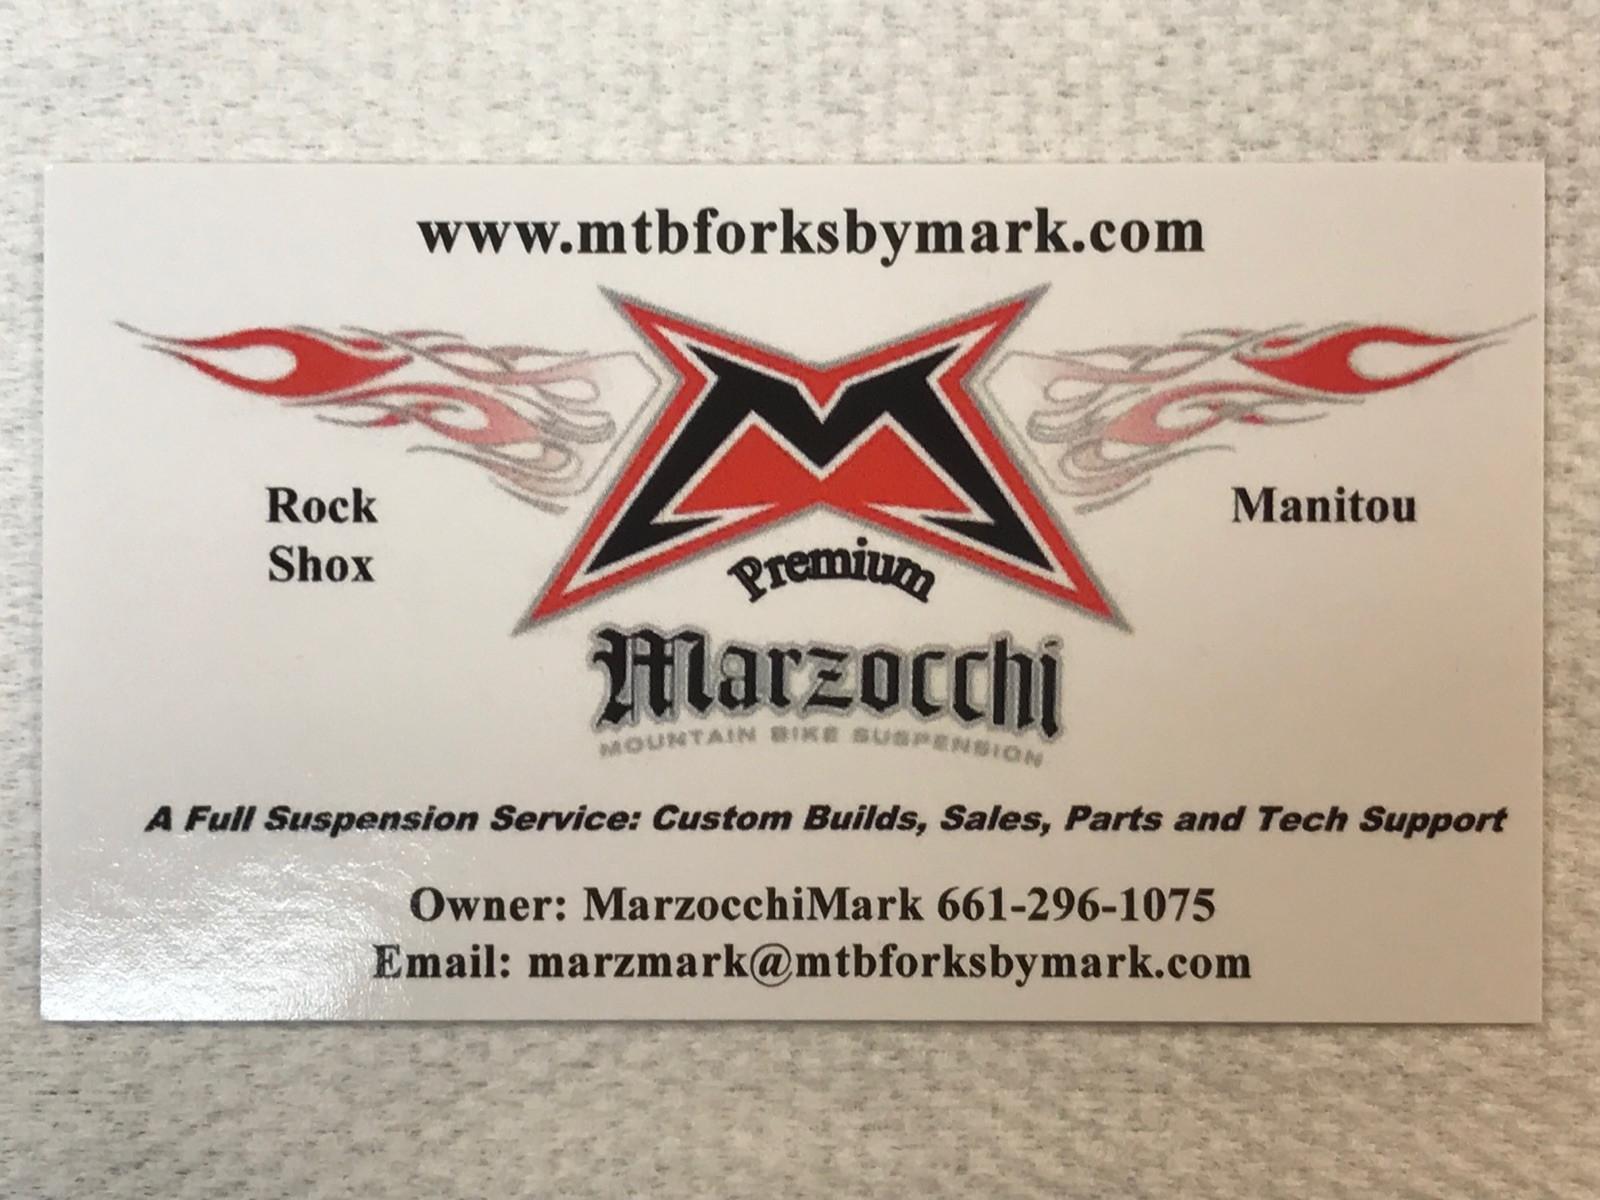 www.mtbforksbymark.com